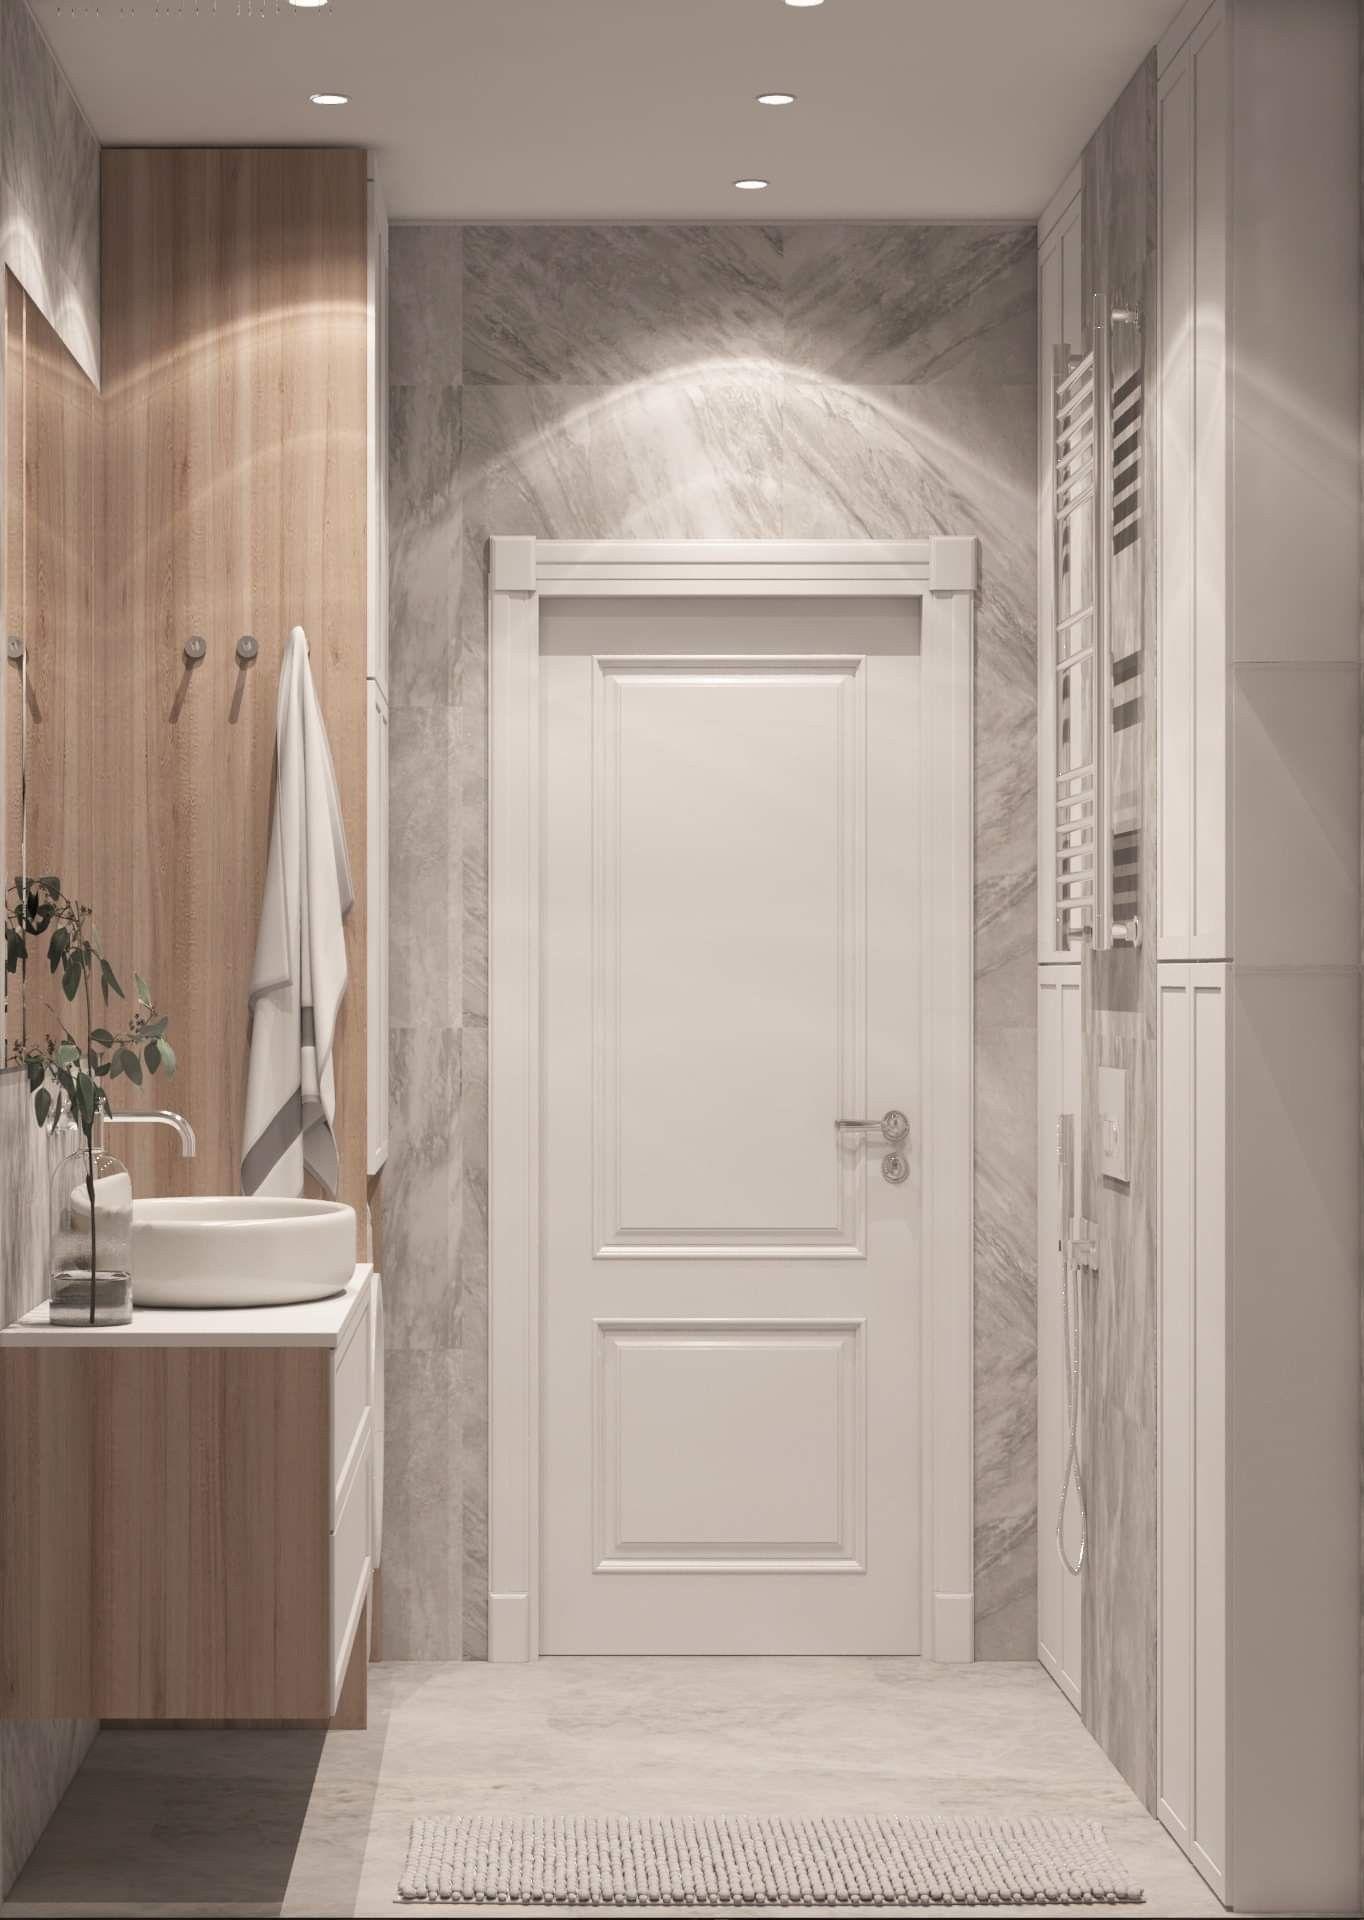 Pin by Elena Novosyolova on bathroom in 2020 Decor, Home